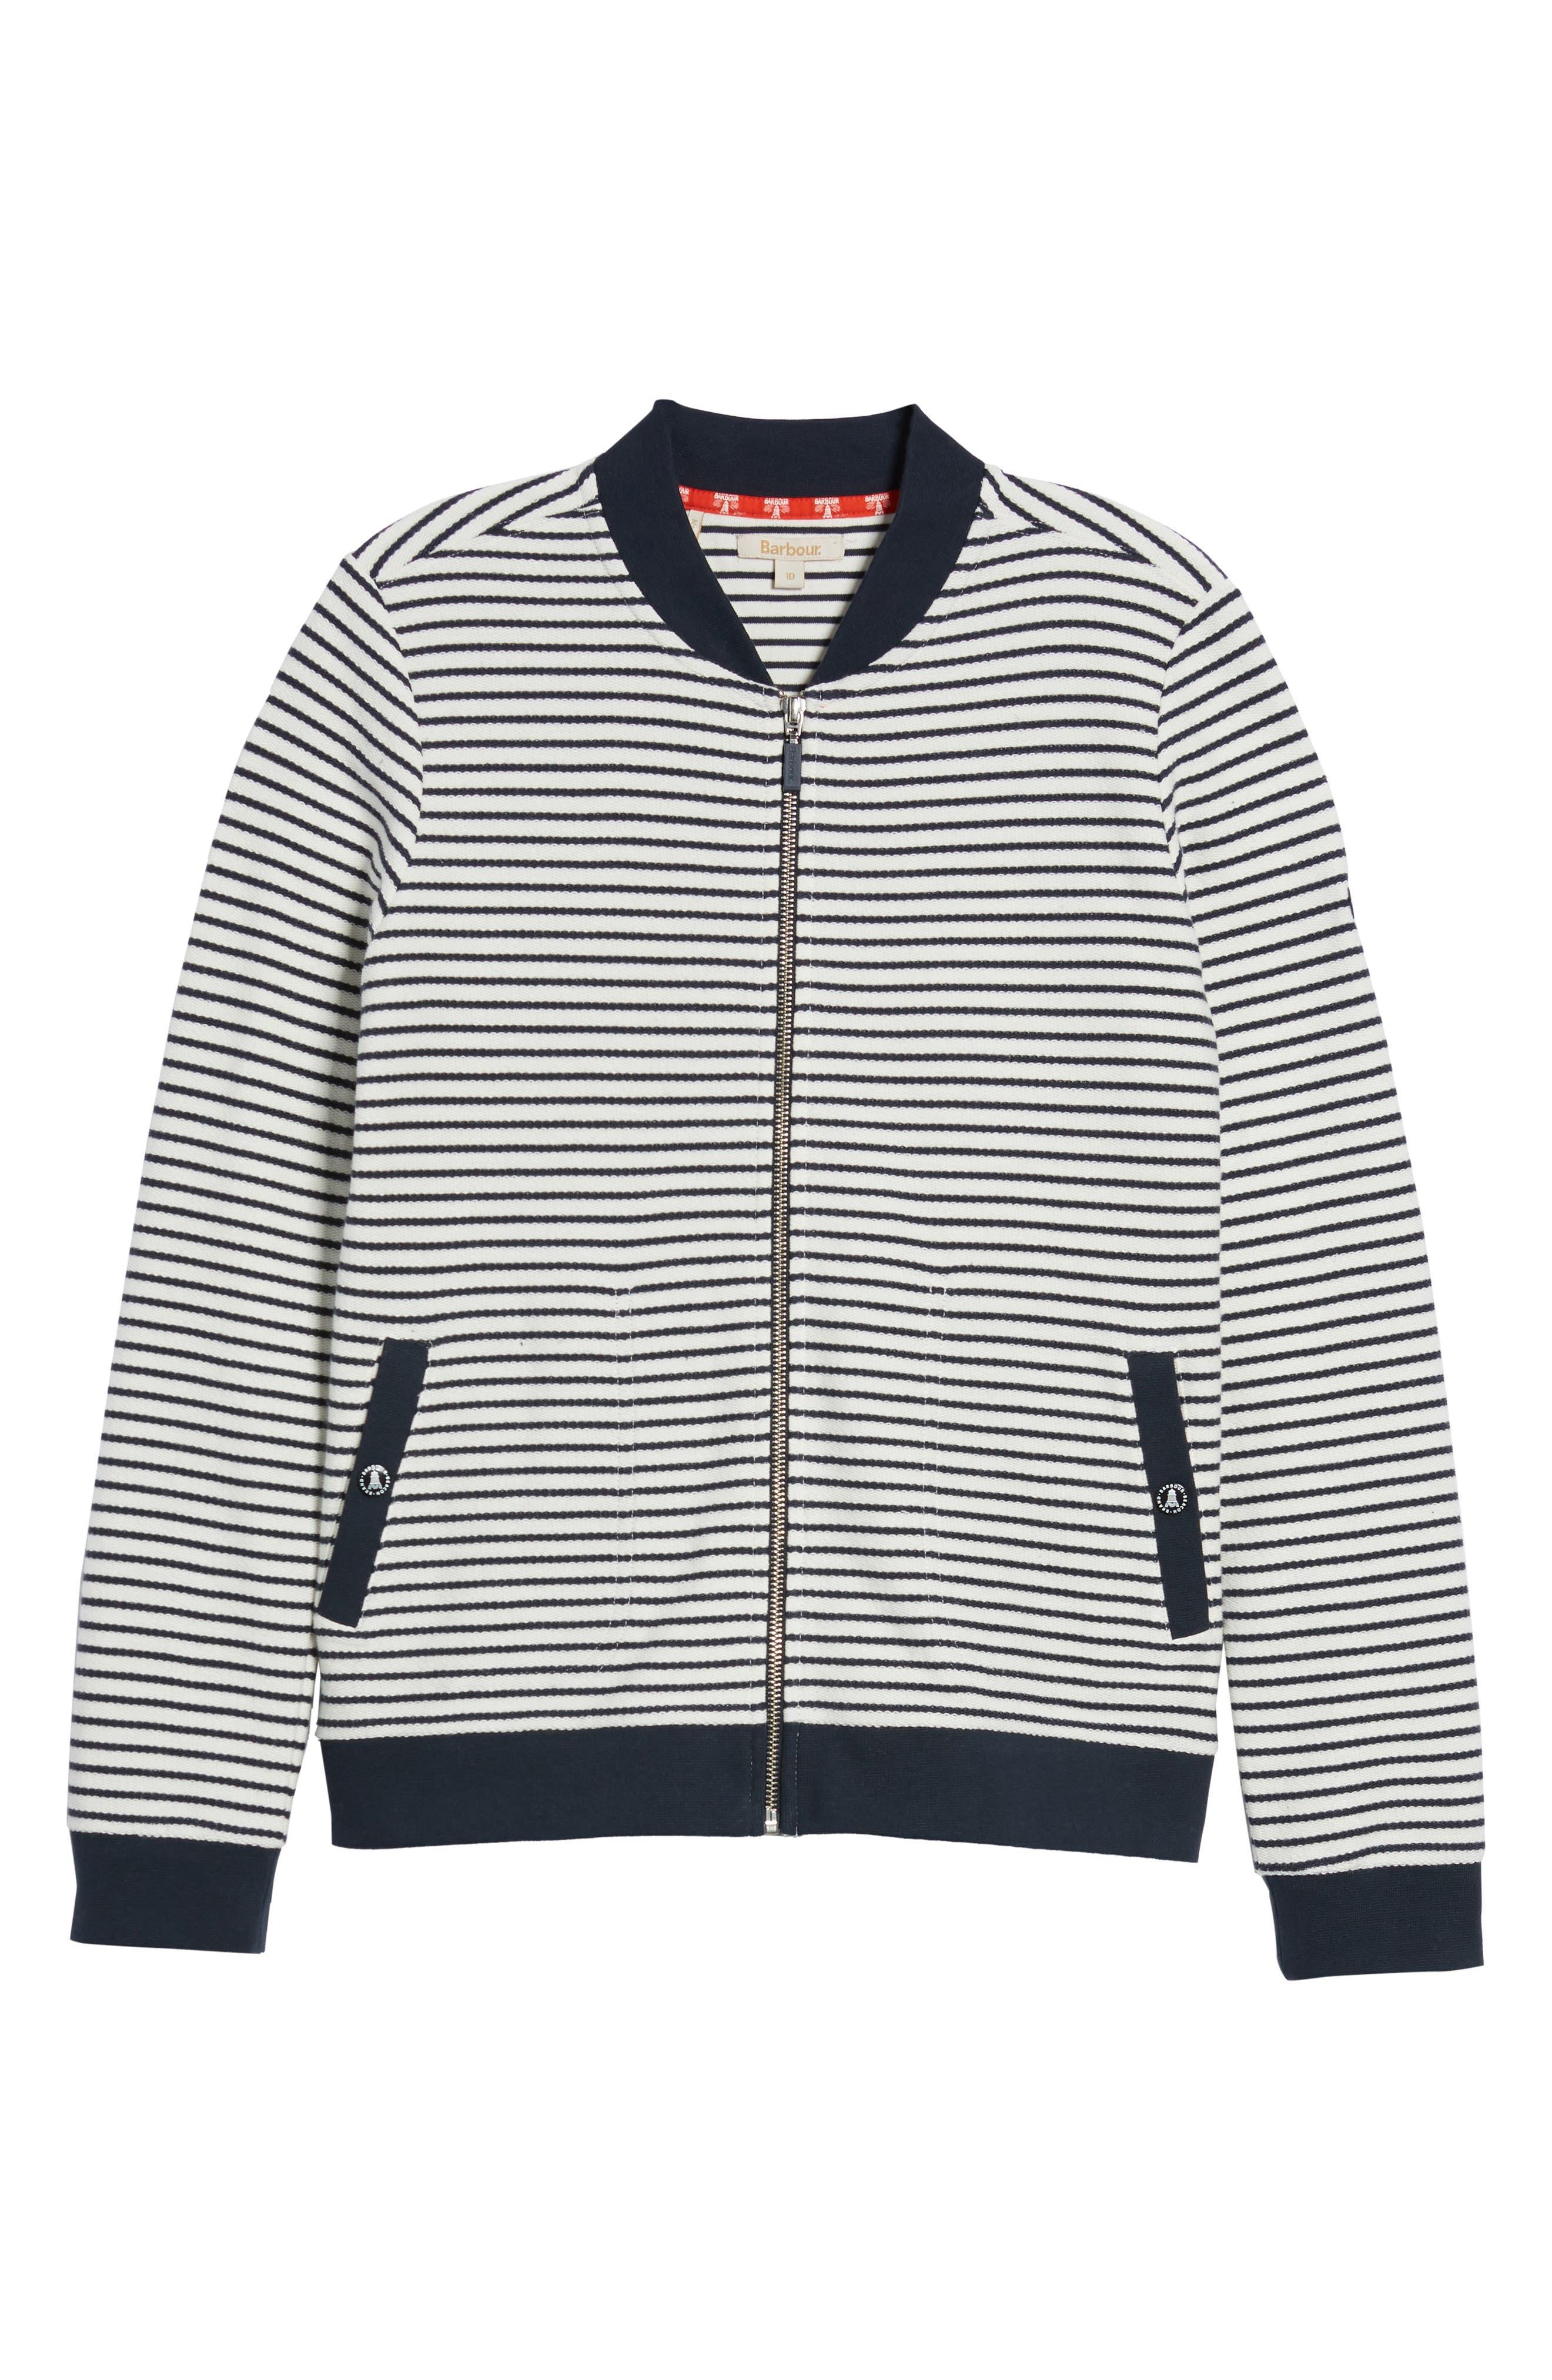 Bamburgh Sweater Jacket,                             Alternate thumbnail 7, color,                             White/ Navy